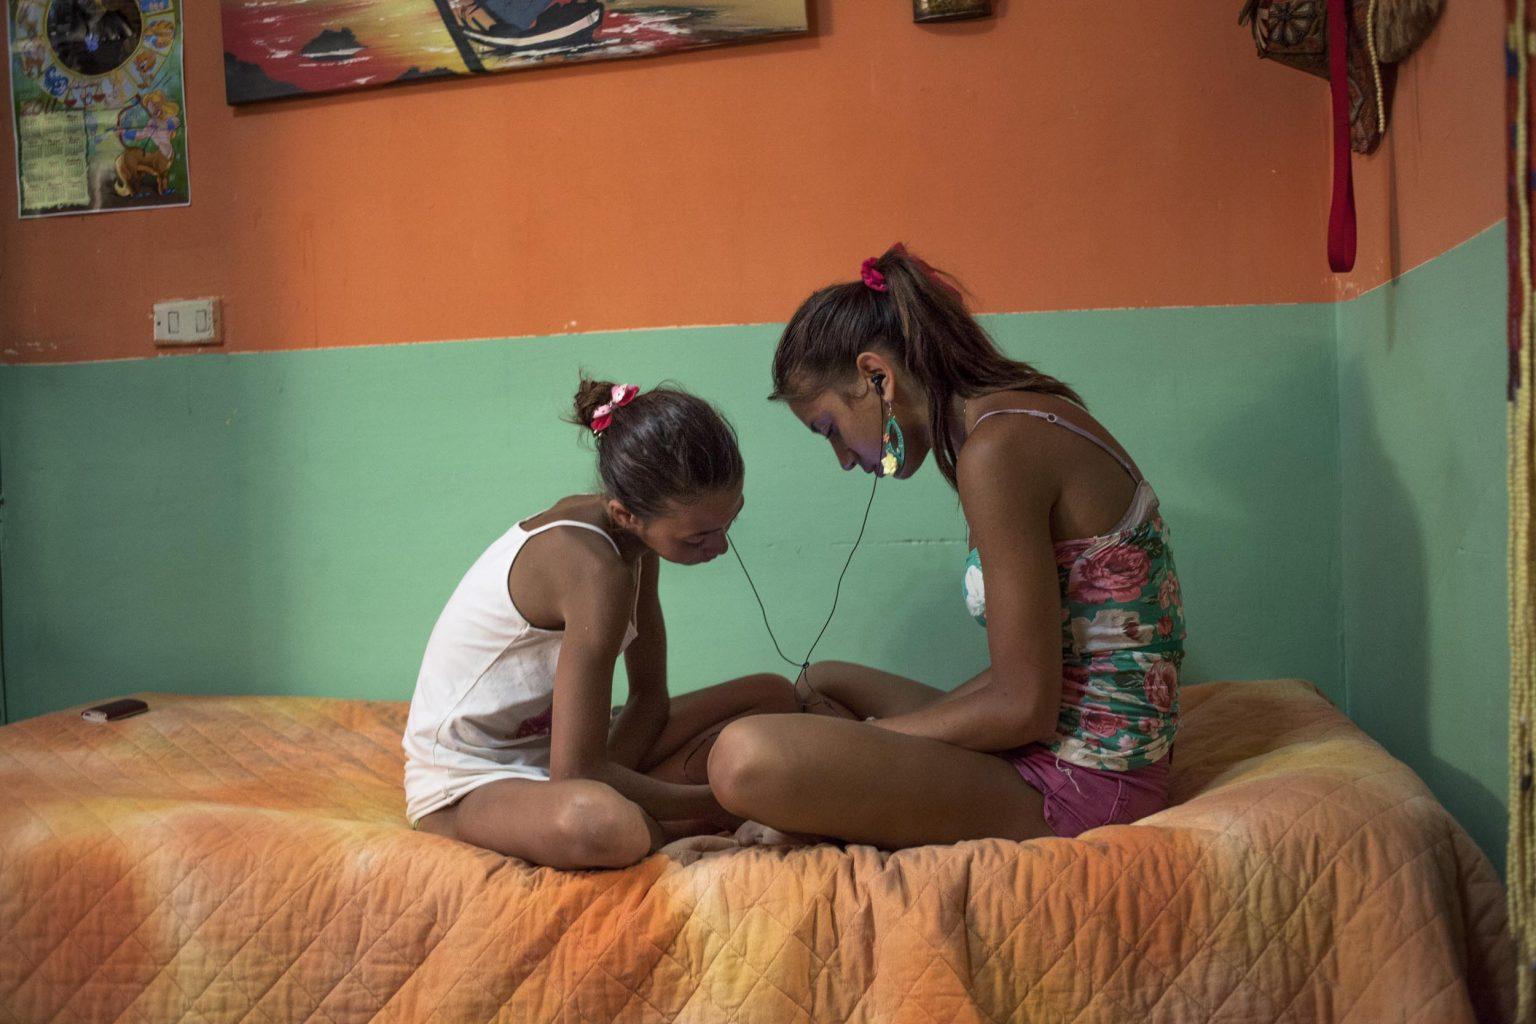 Federica and Alessandra listen to neo-melodic neapoletan music.